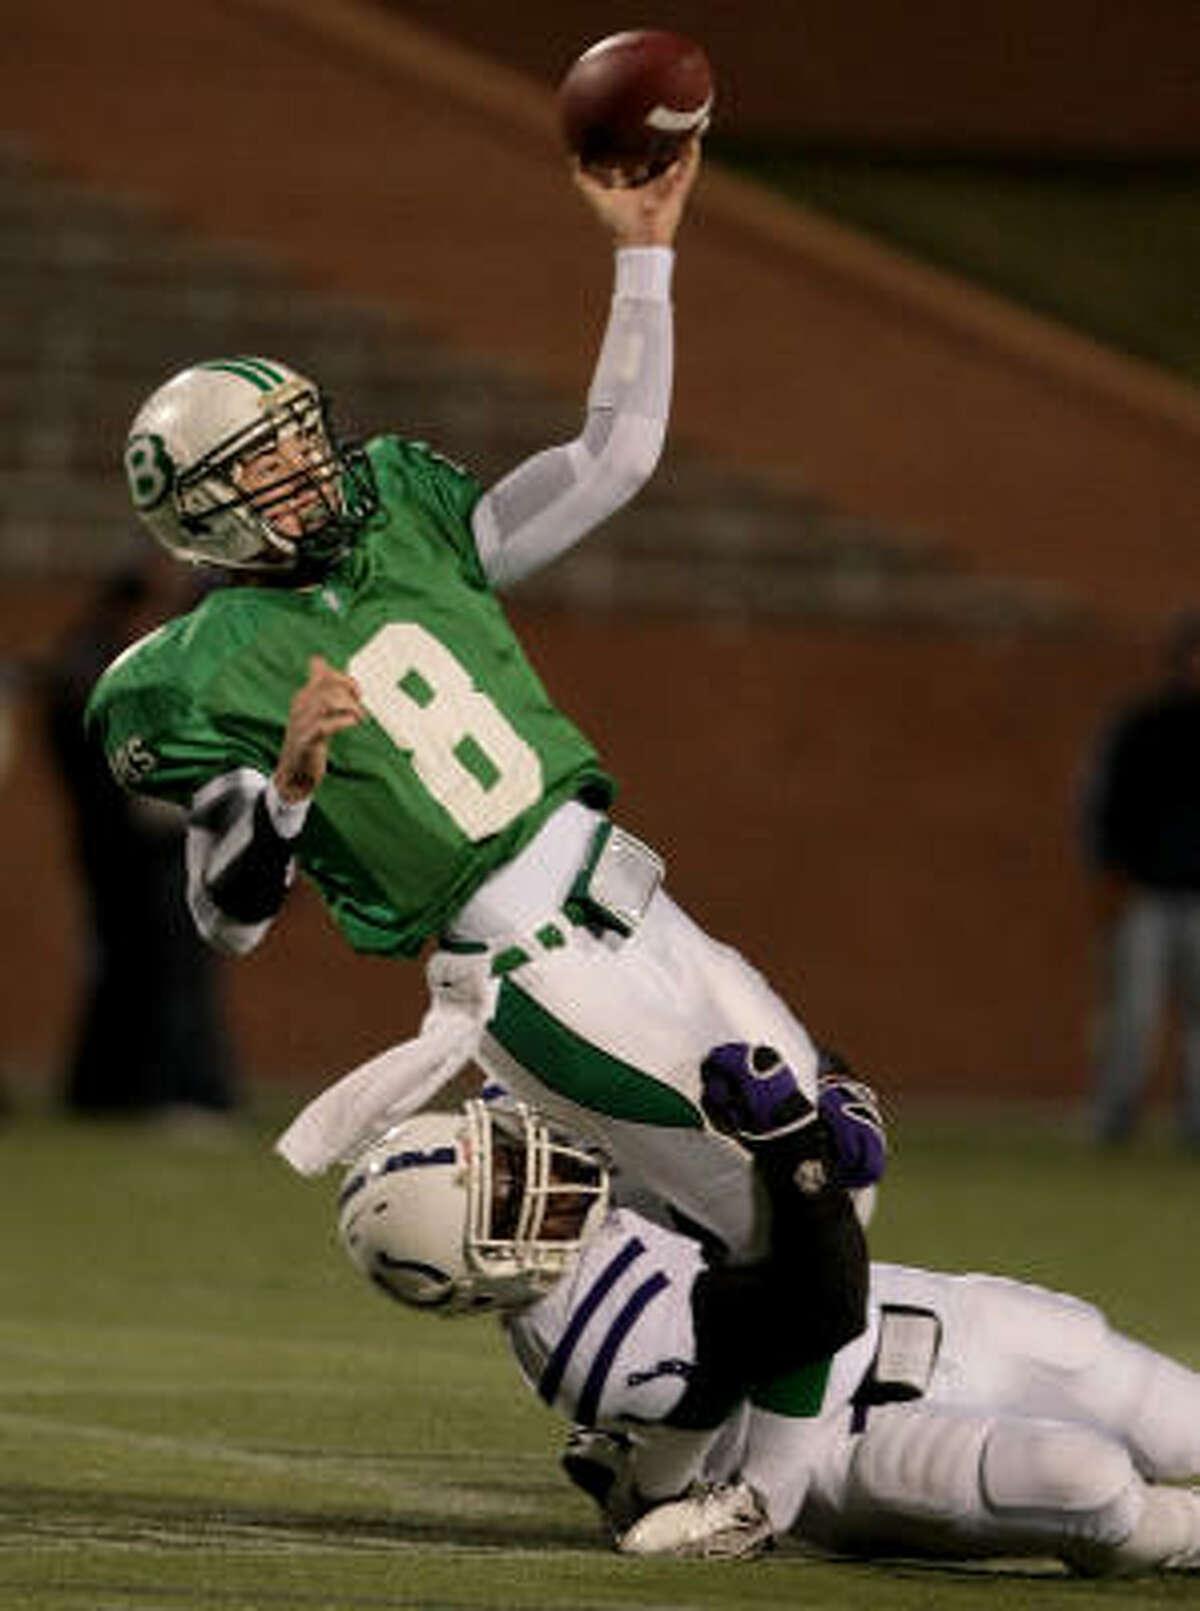 Brenham quarterback Ty Schlottmann gets rid of the ball before being taken down by Dayton tackle Darrian Wright.